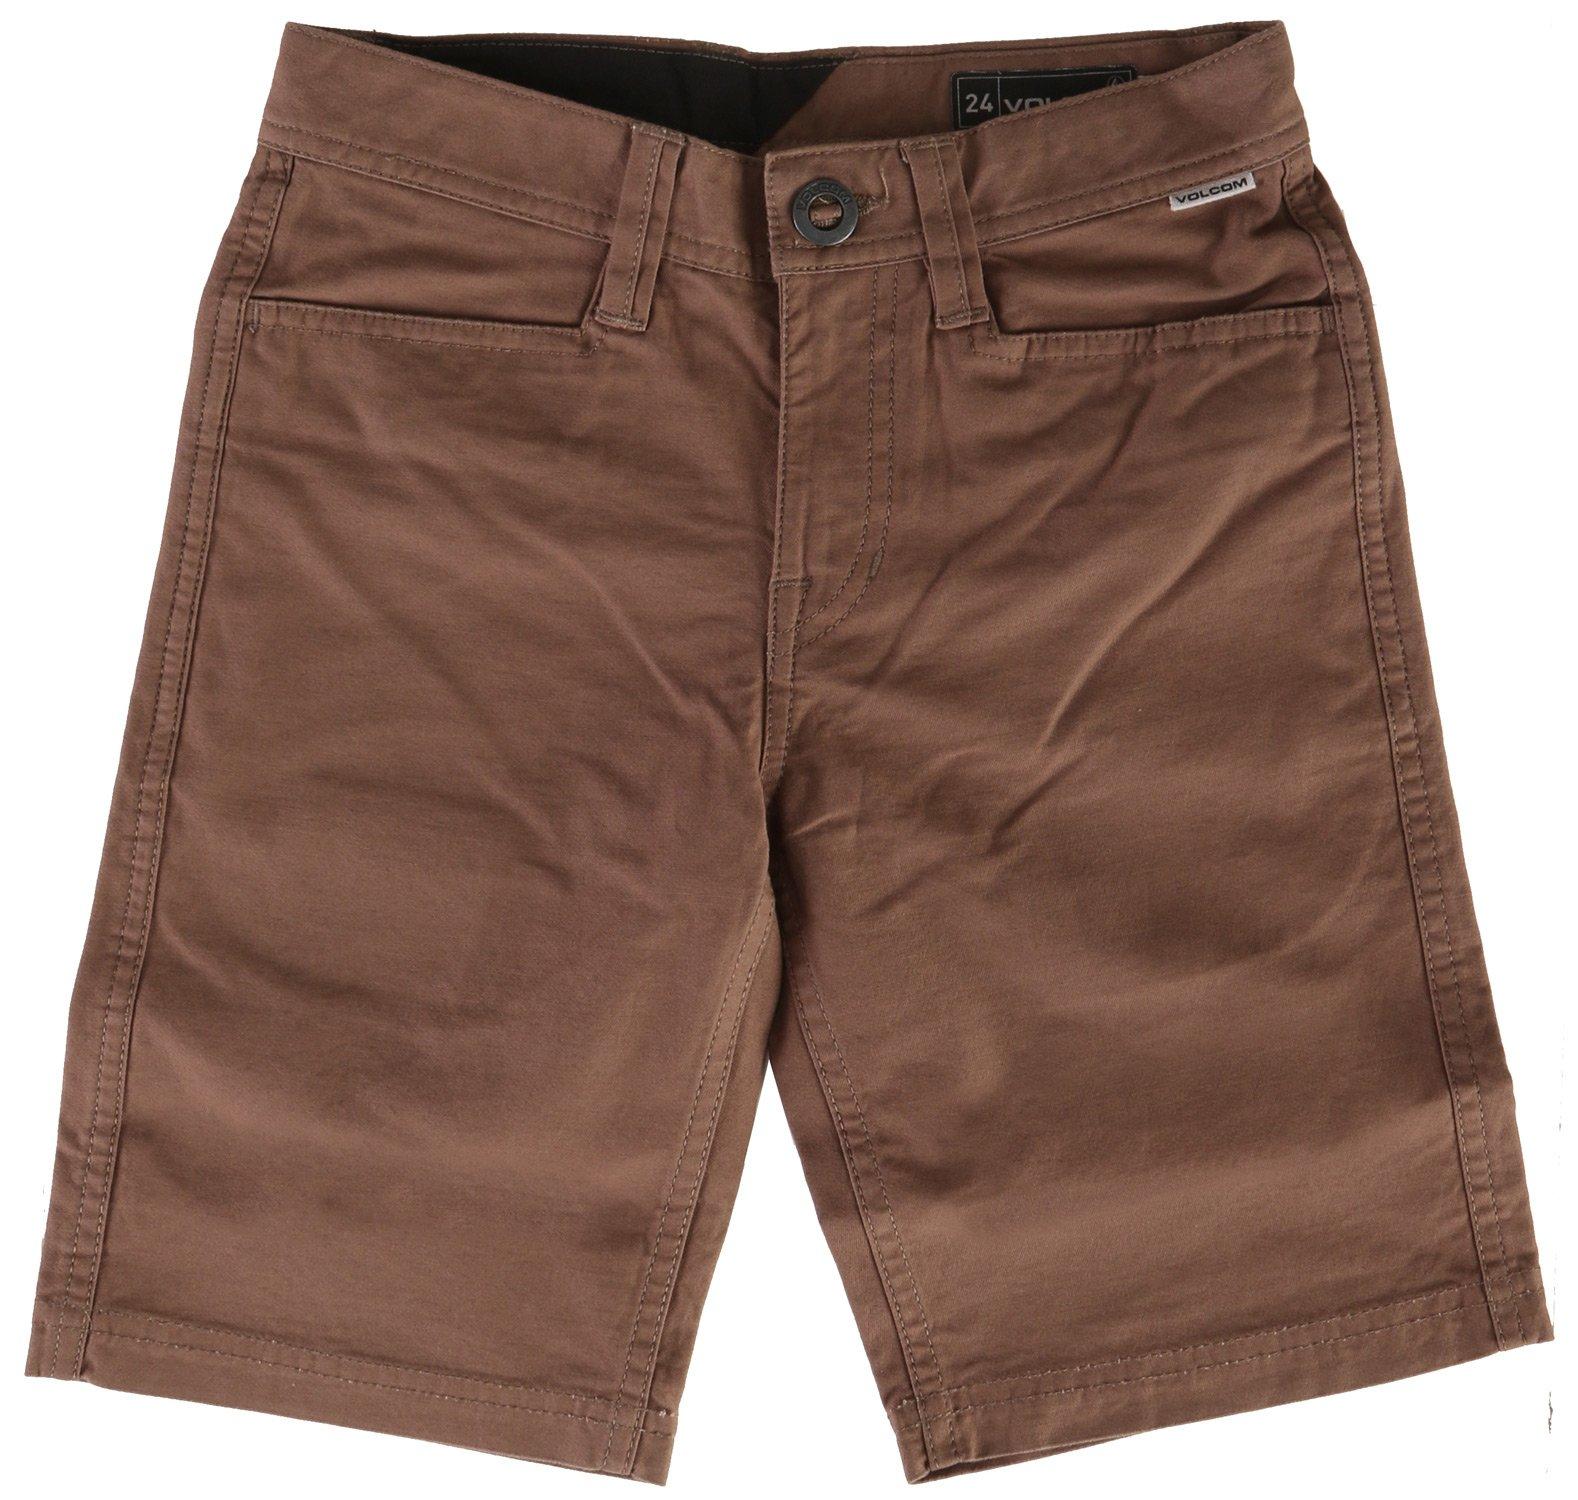 Volcom Kids  Boy's VSM Gritter Shorts (Big Kids) Mushroom Shorts